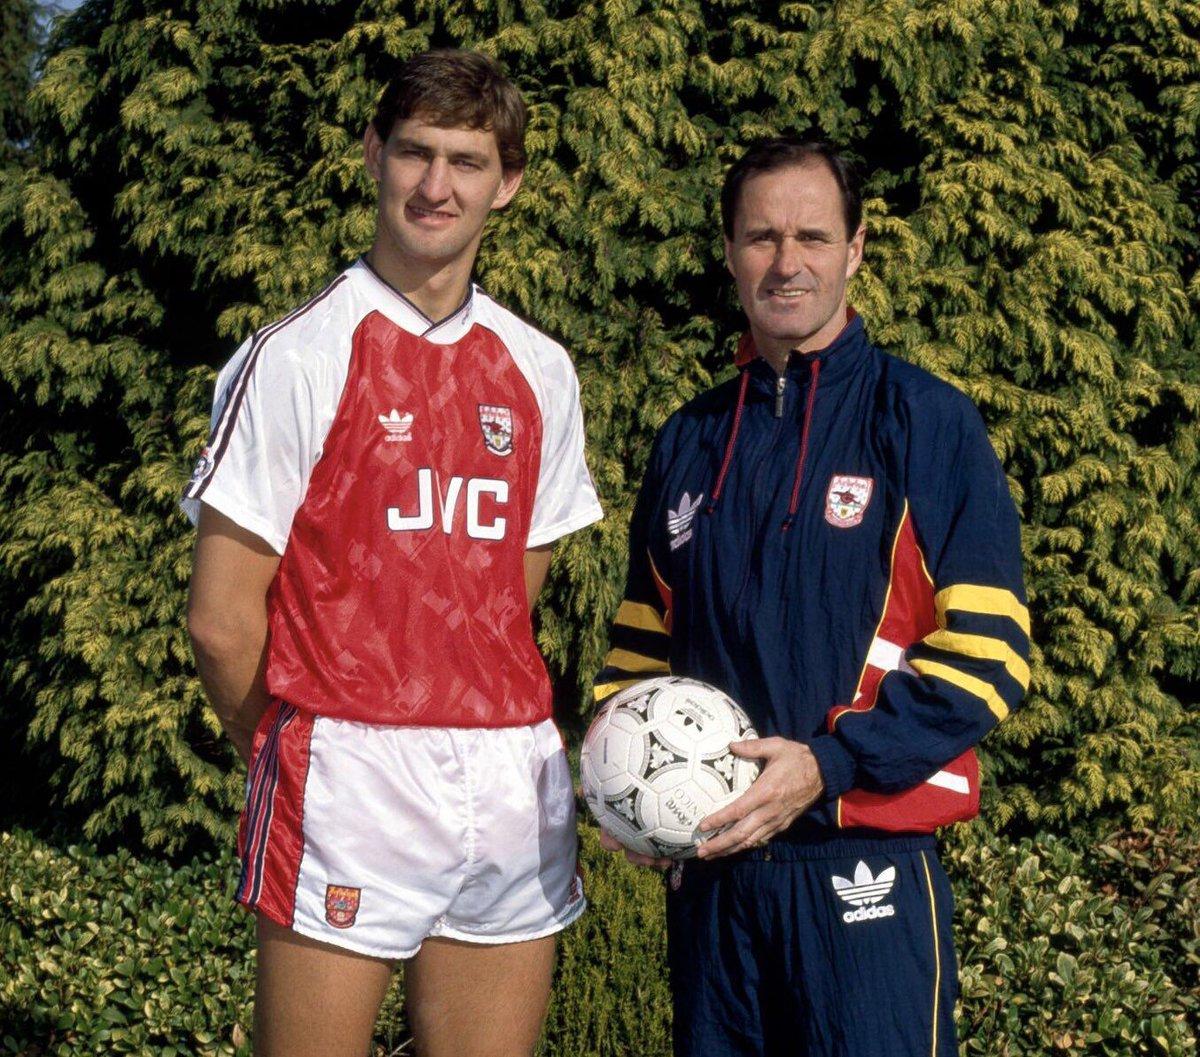 Tony Adams and George Graham in 1992 and 2019 #Arsenal   [ by Bob Thomas &amp; Stuart MacFarlane]<br>http://pic.twitter.com/5fvasedGae